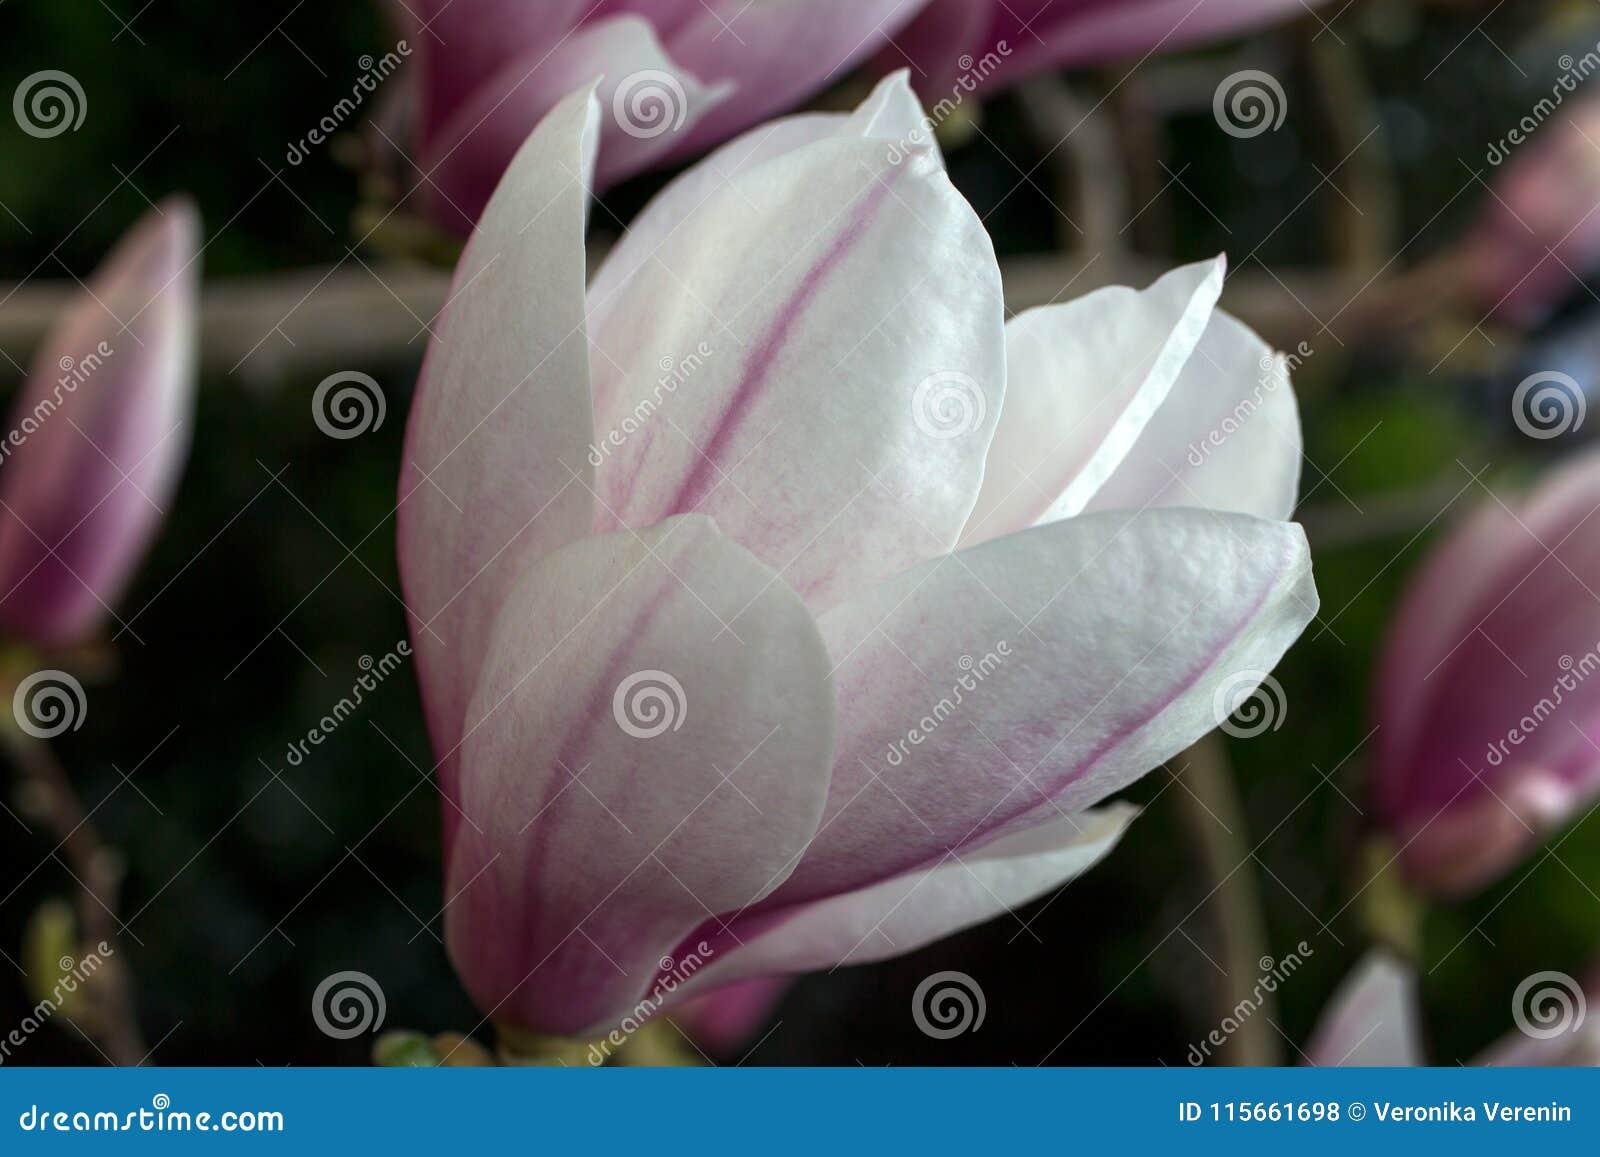 Magnolia Sieboldii Tree Stock Photo Image Of Closeup 115661698